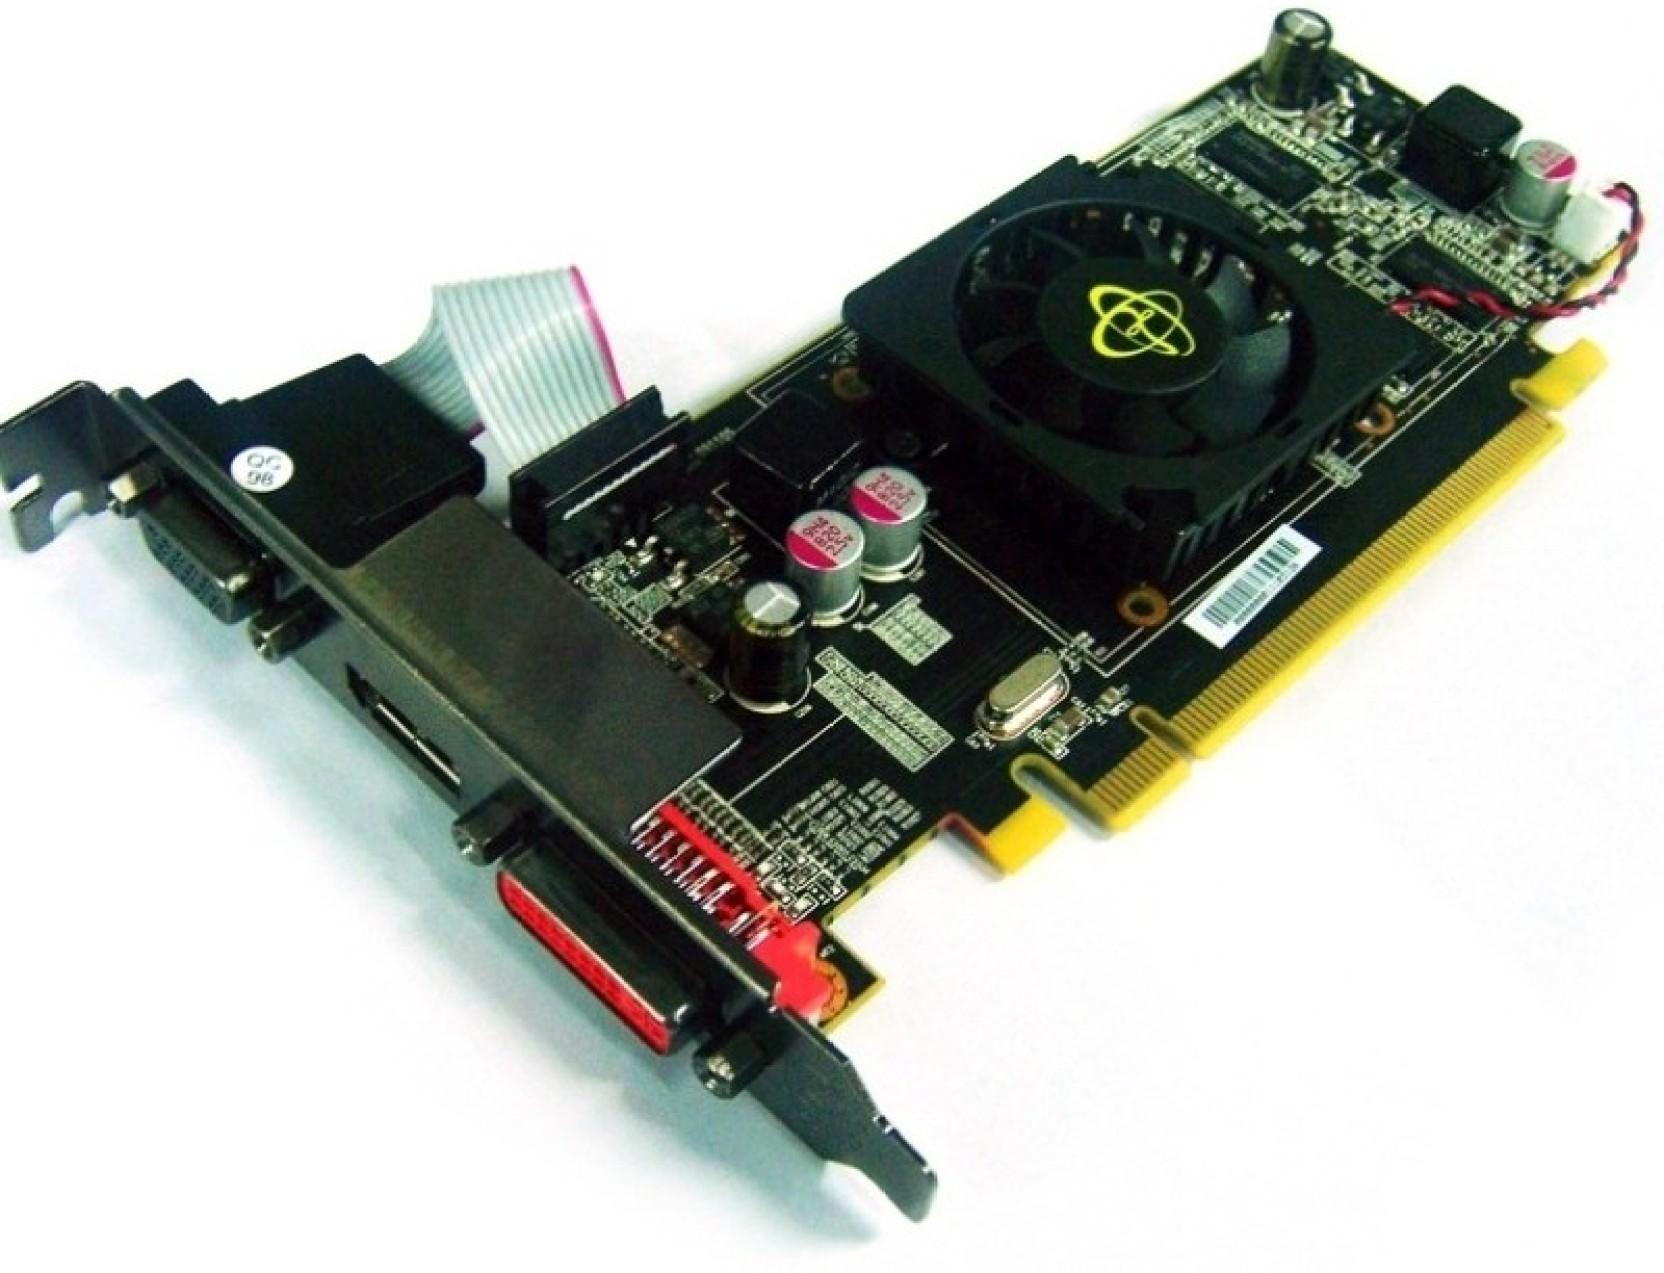 XFX AMD/ATI Radeon HD 4350 512 MB DDR2 Graphics Card